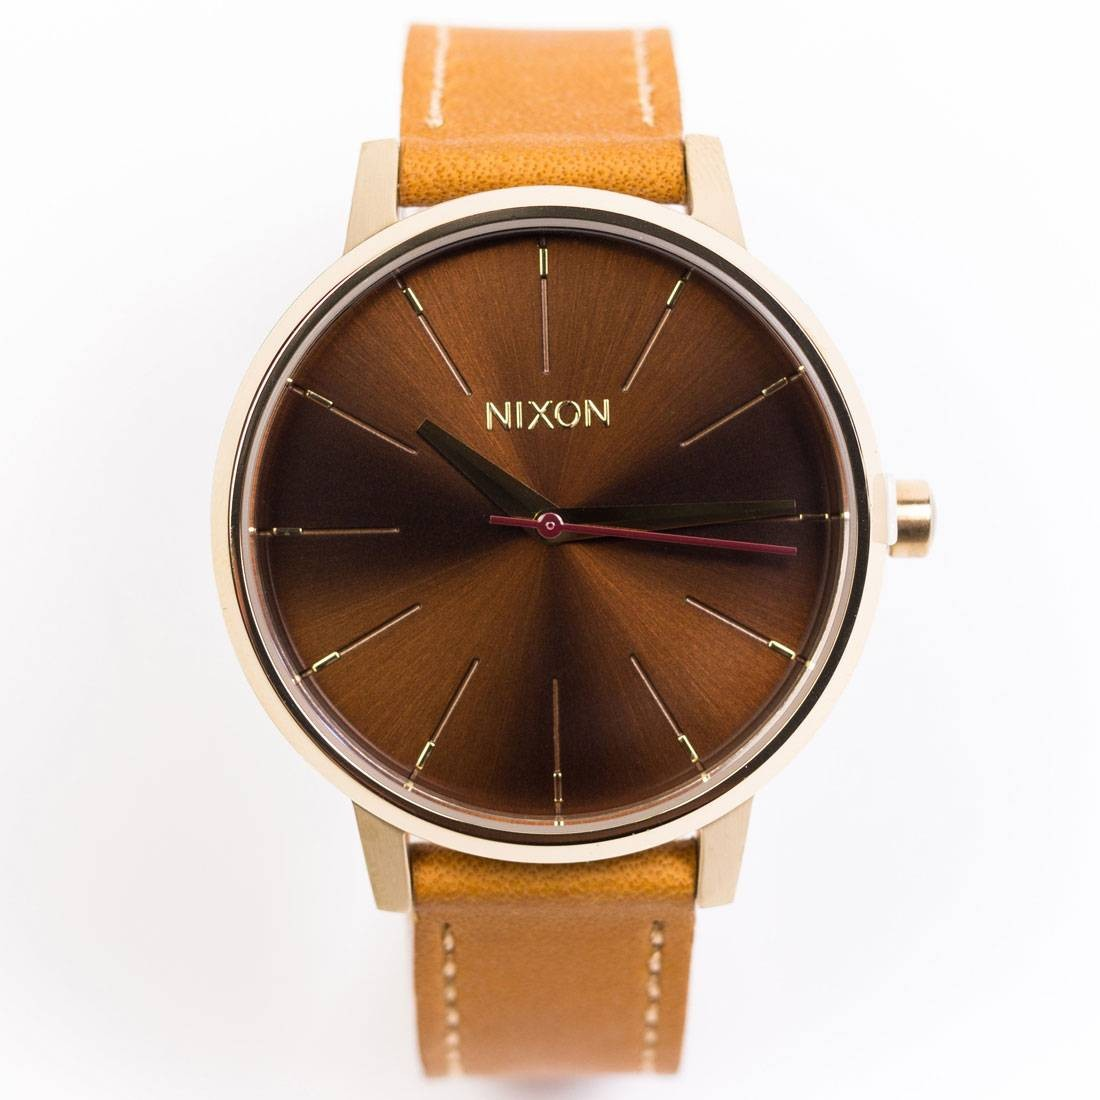 17e750f8d Nixon Kensington Leather Watch gold manu